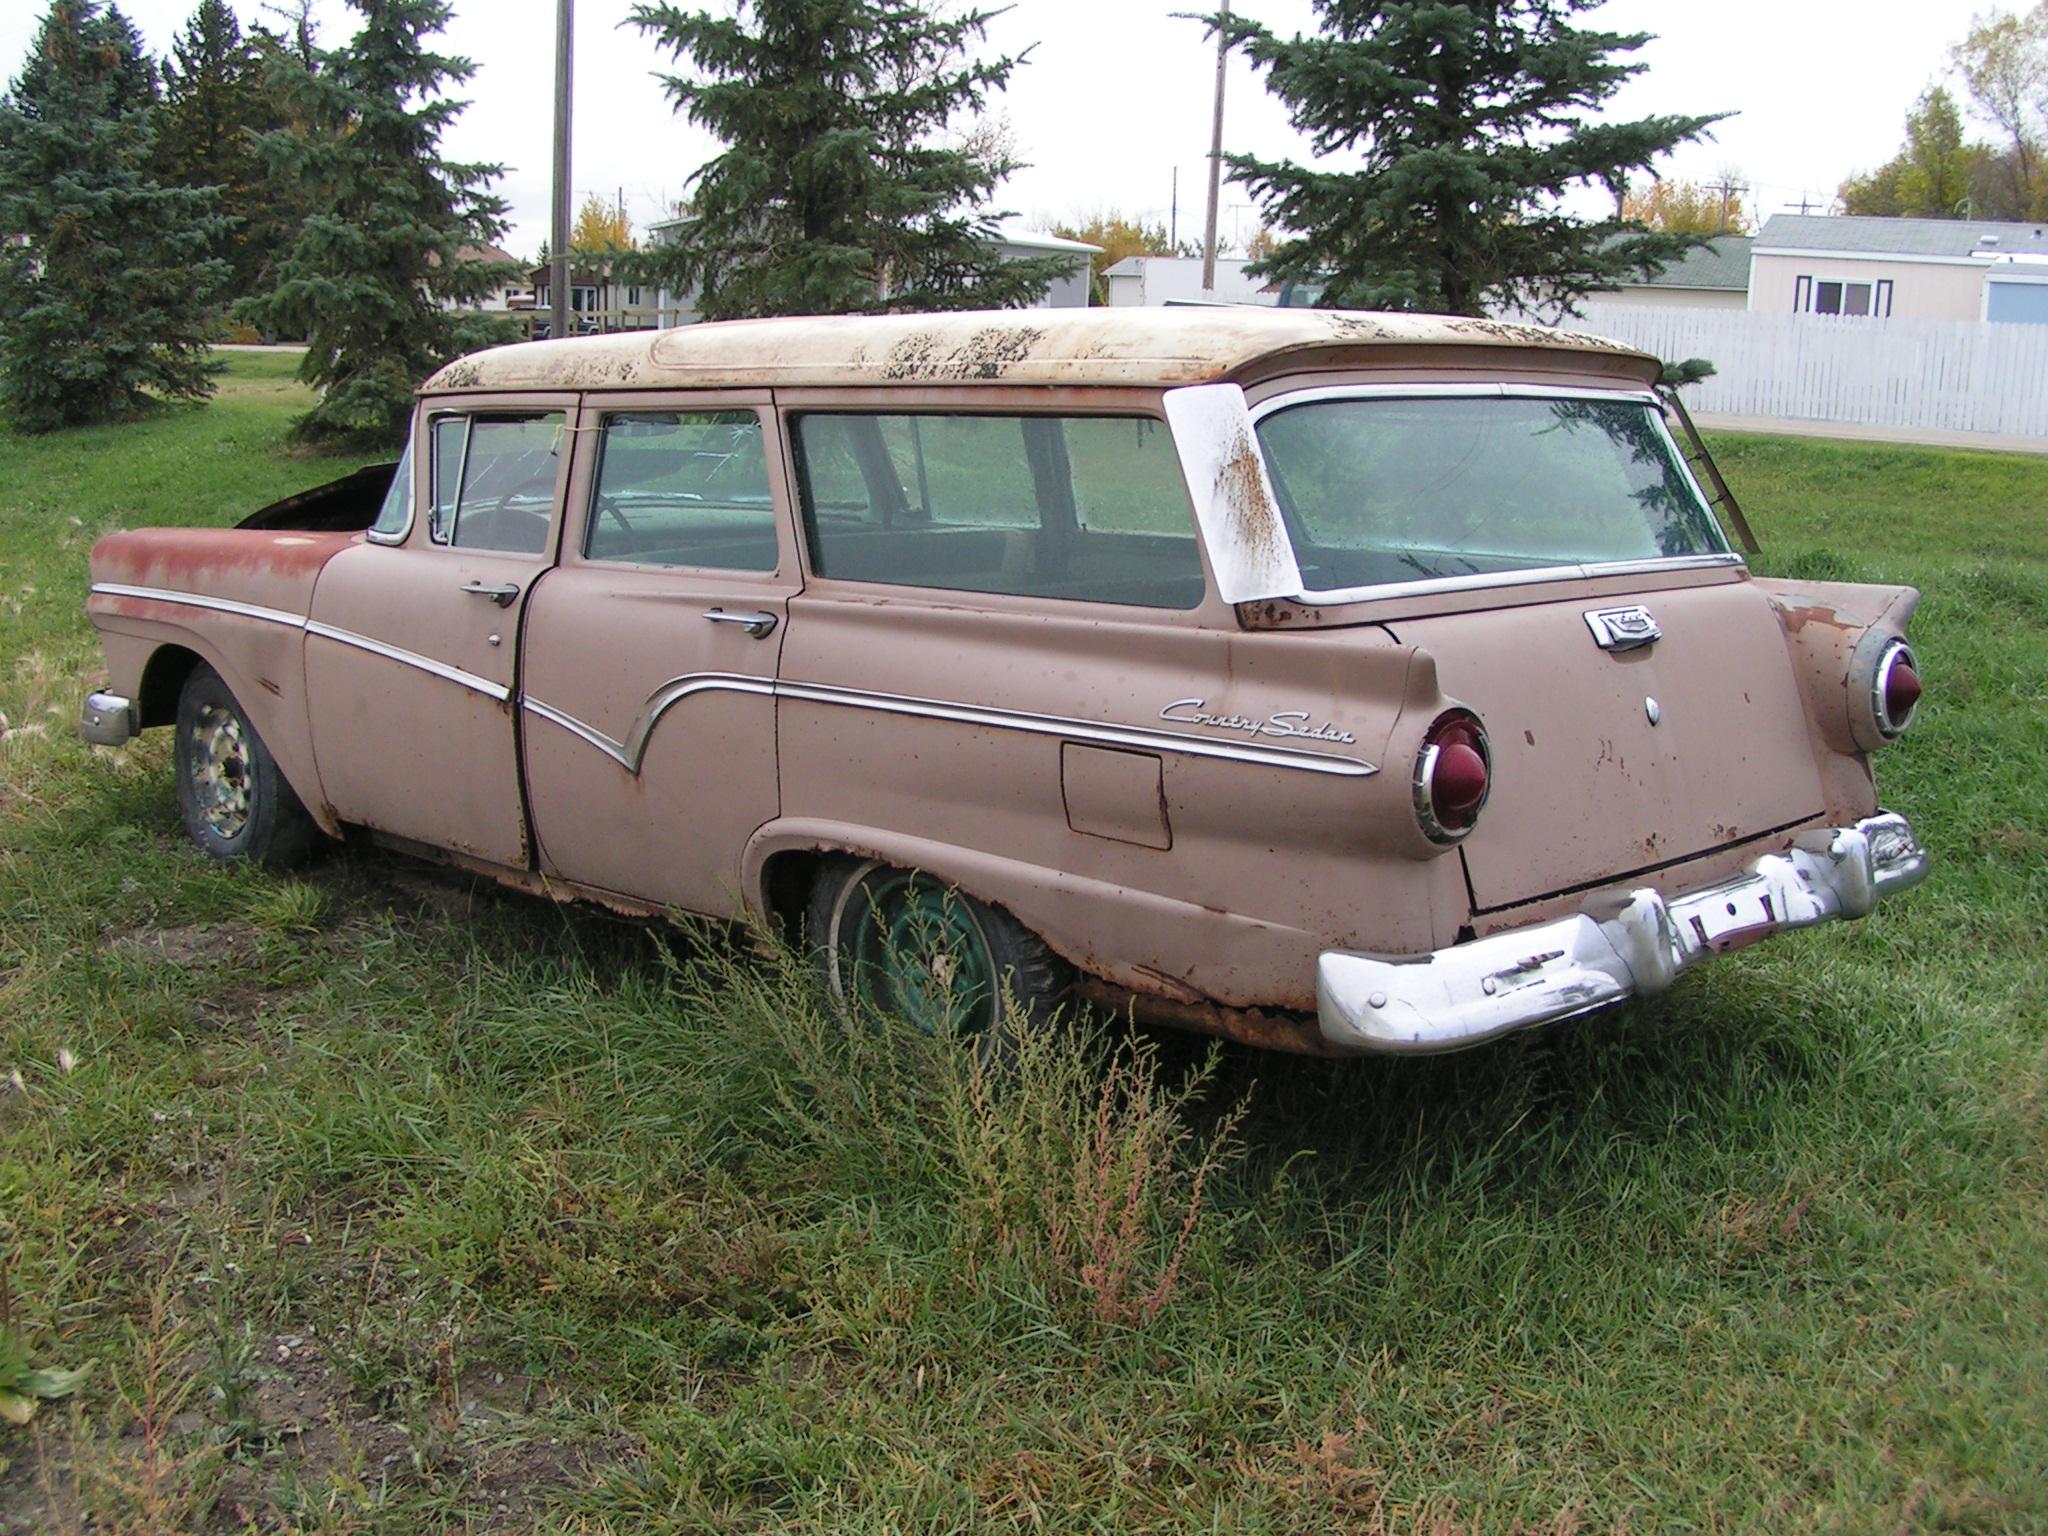 File:1957 Ford Country Sedan Wagon (1467694963) jpg